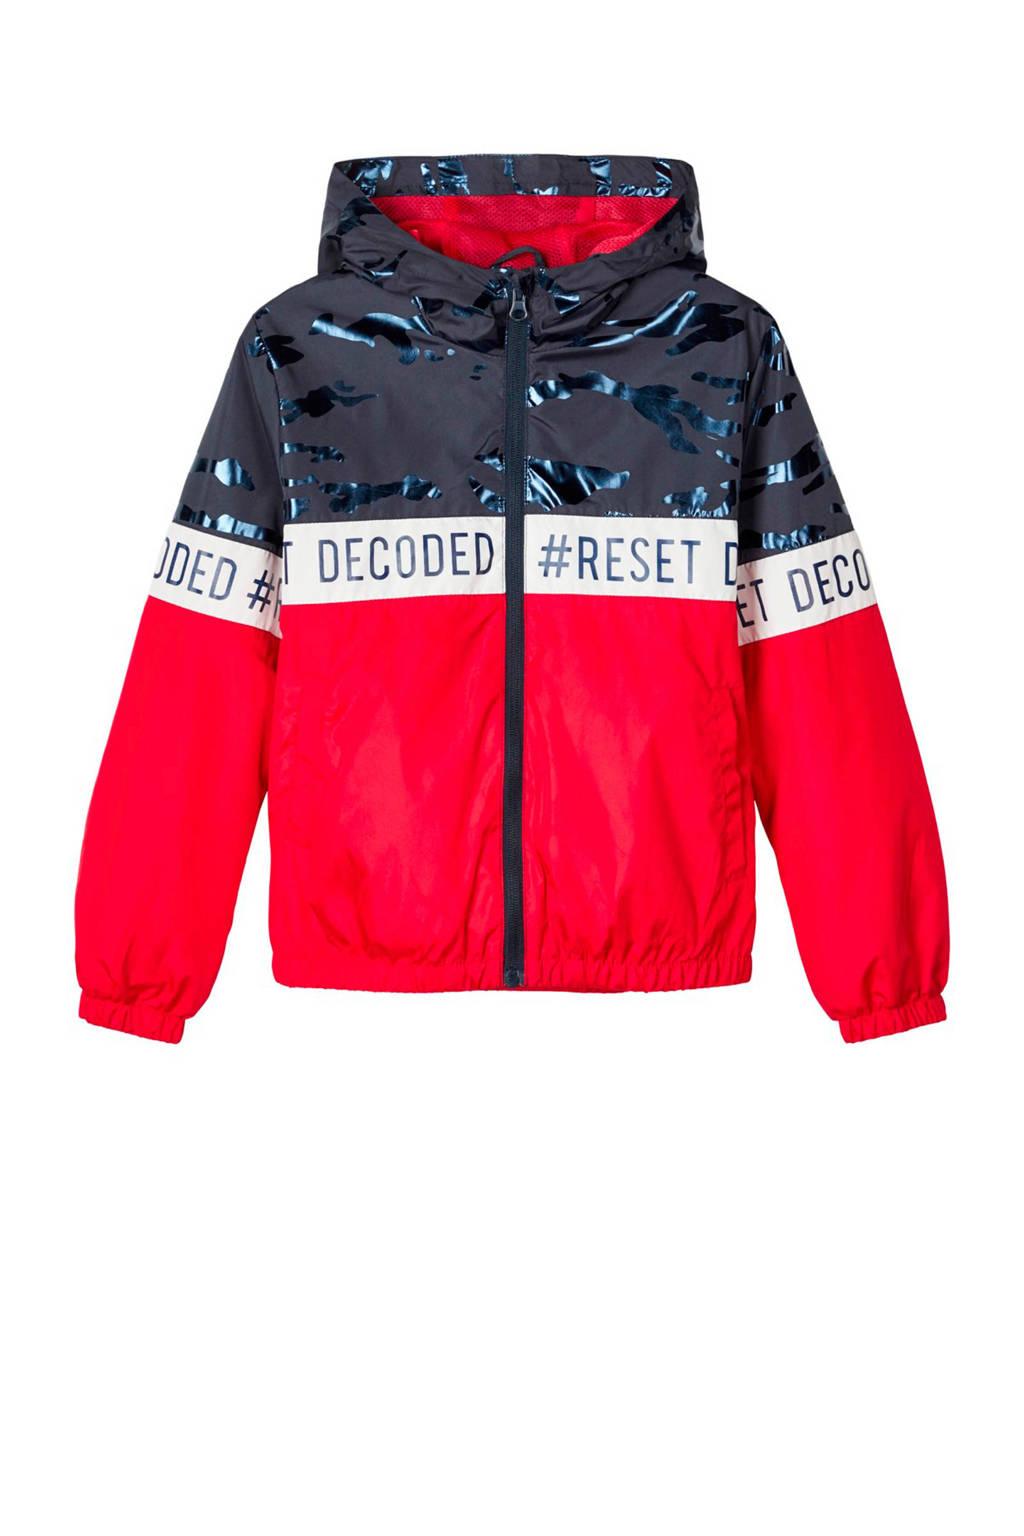 NAME IT KIDS zomerjas Milo rood/donkerblauw/wit, Rood/donkerblauw/wit